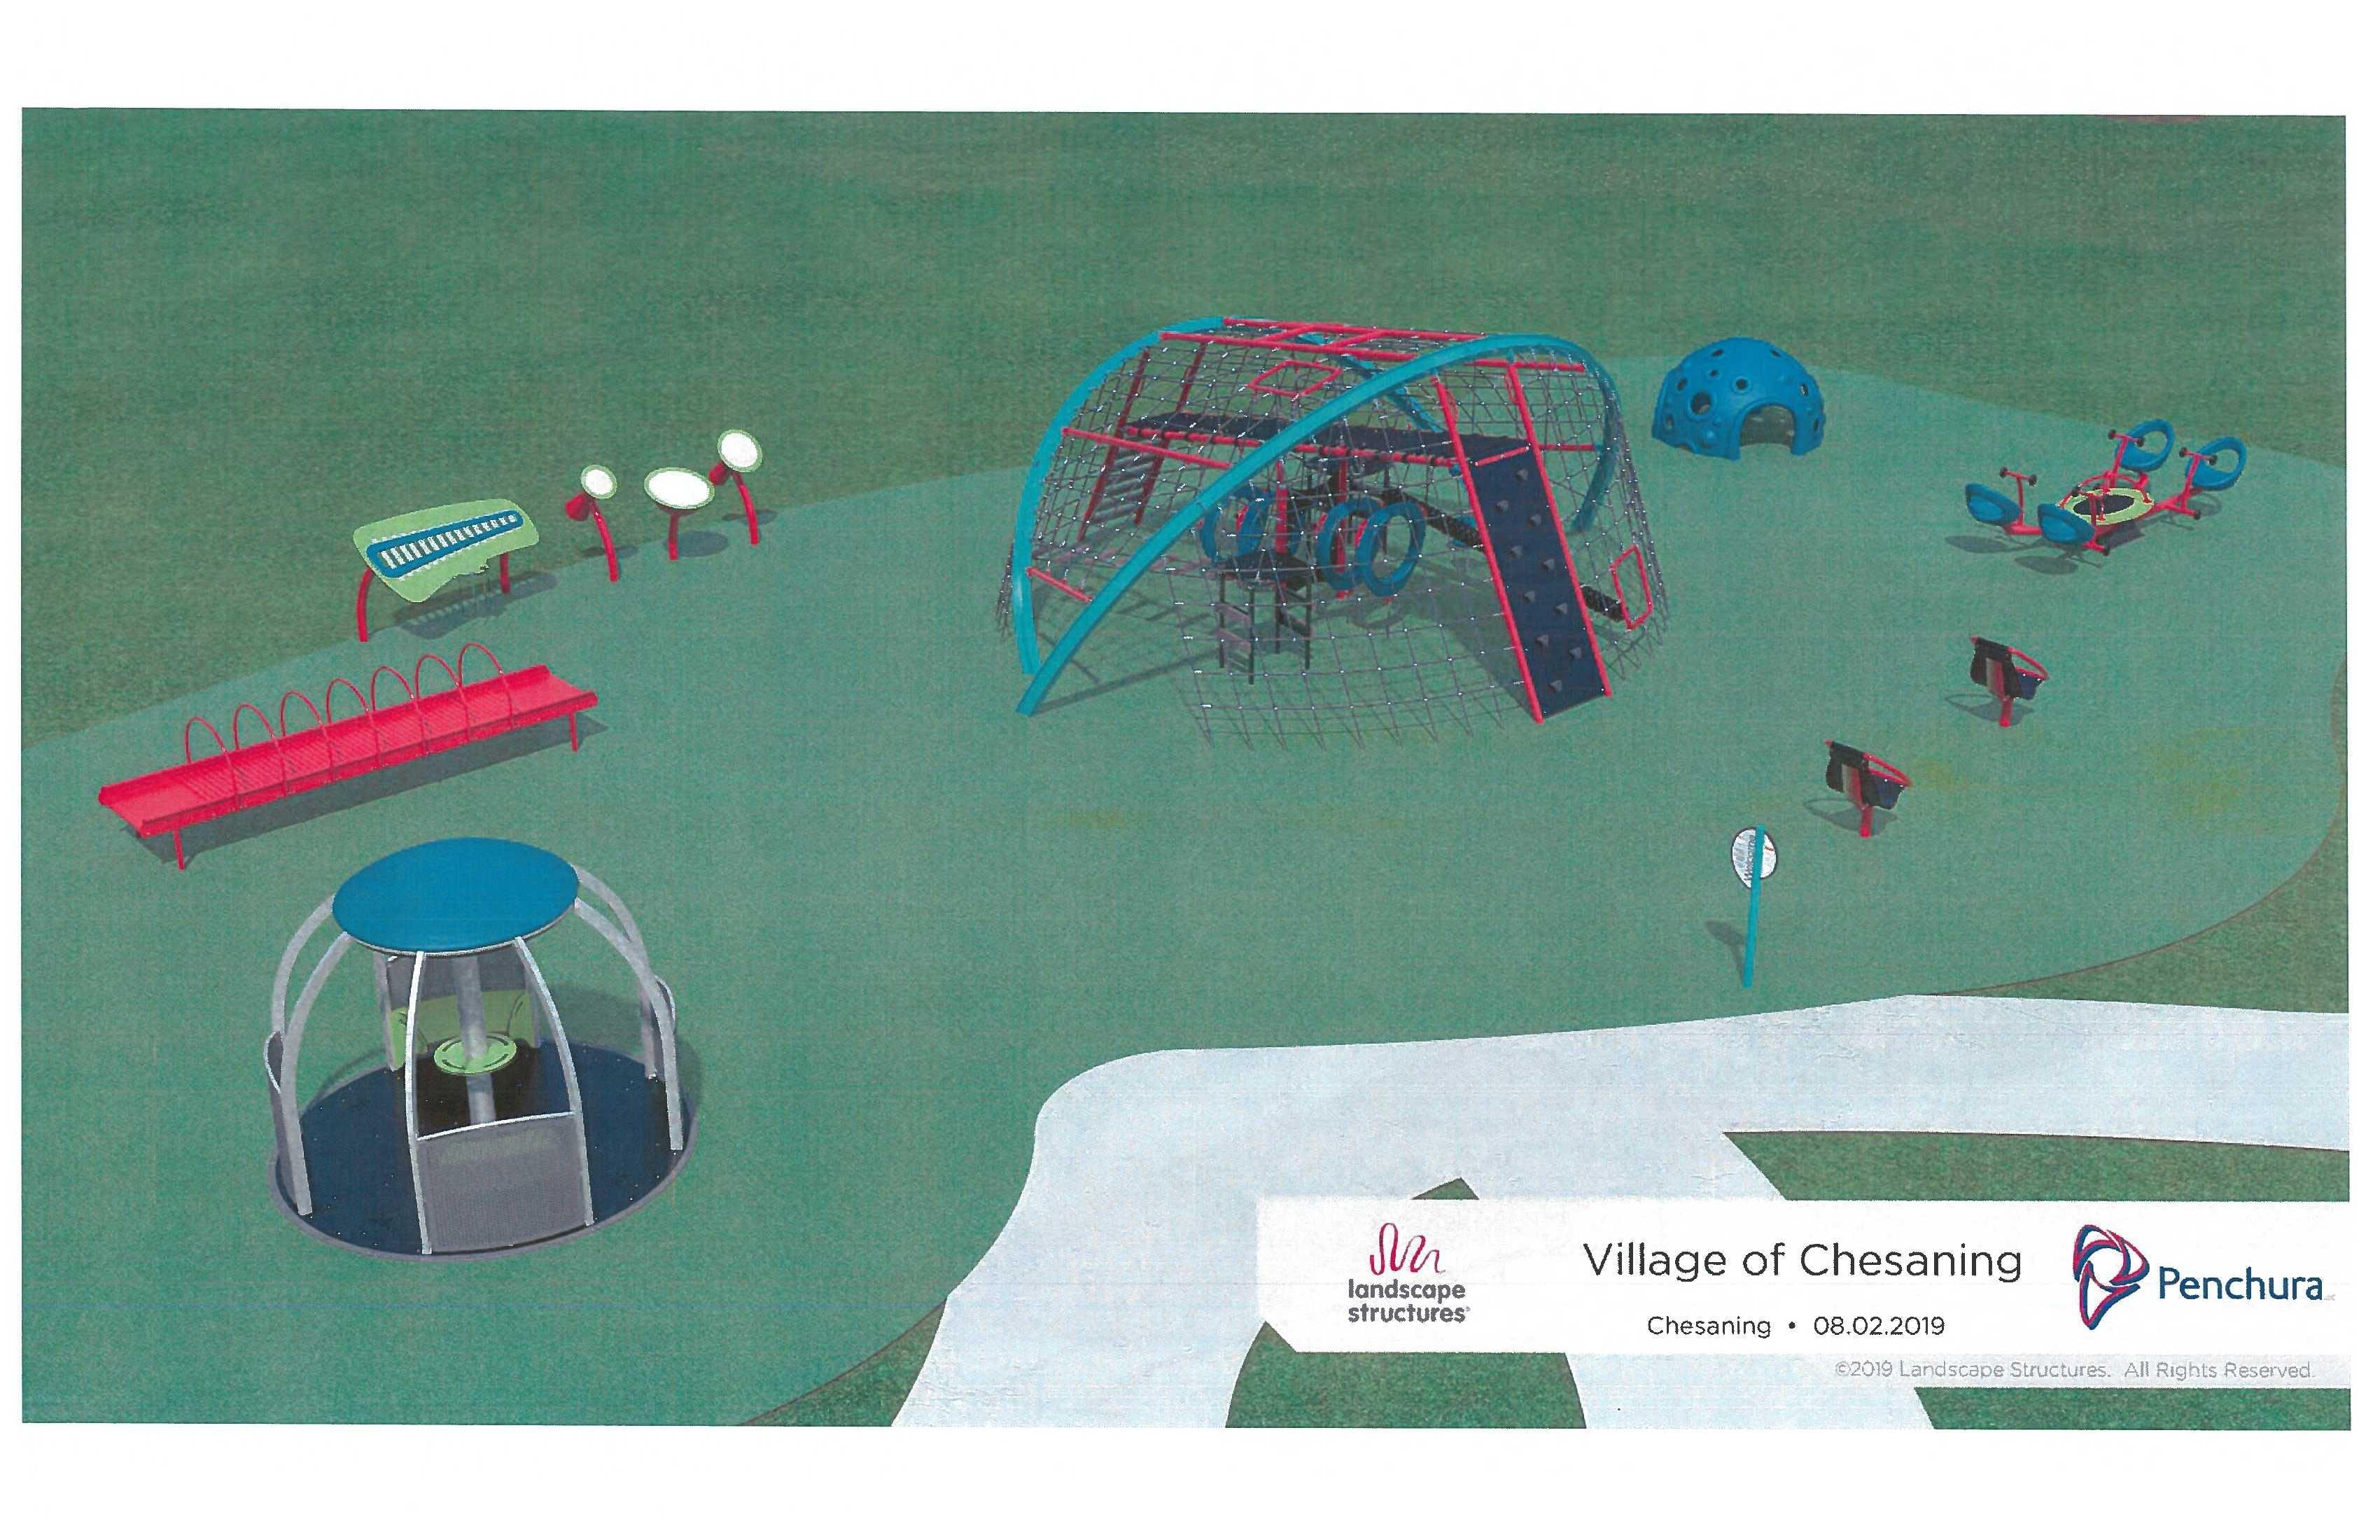 Showboat Playground - Stations